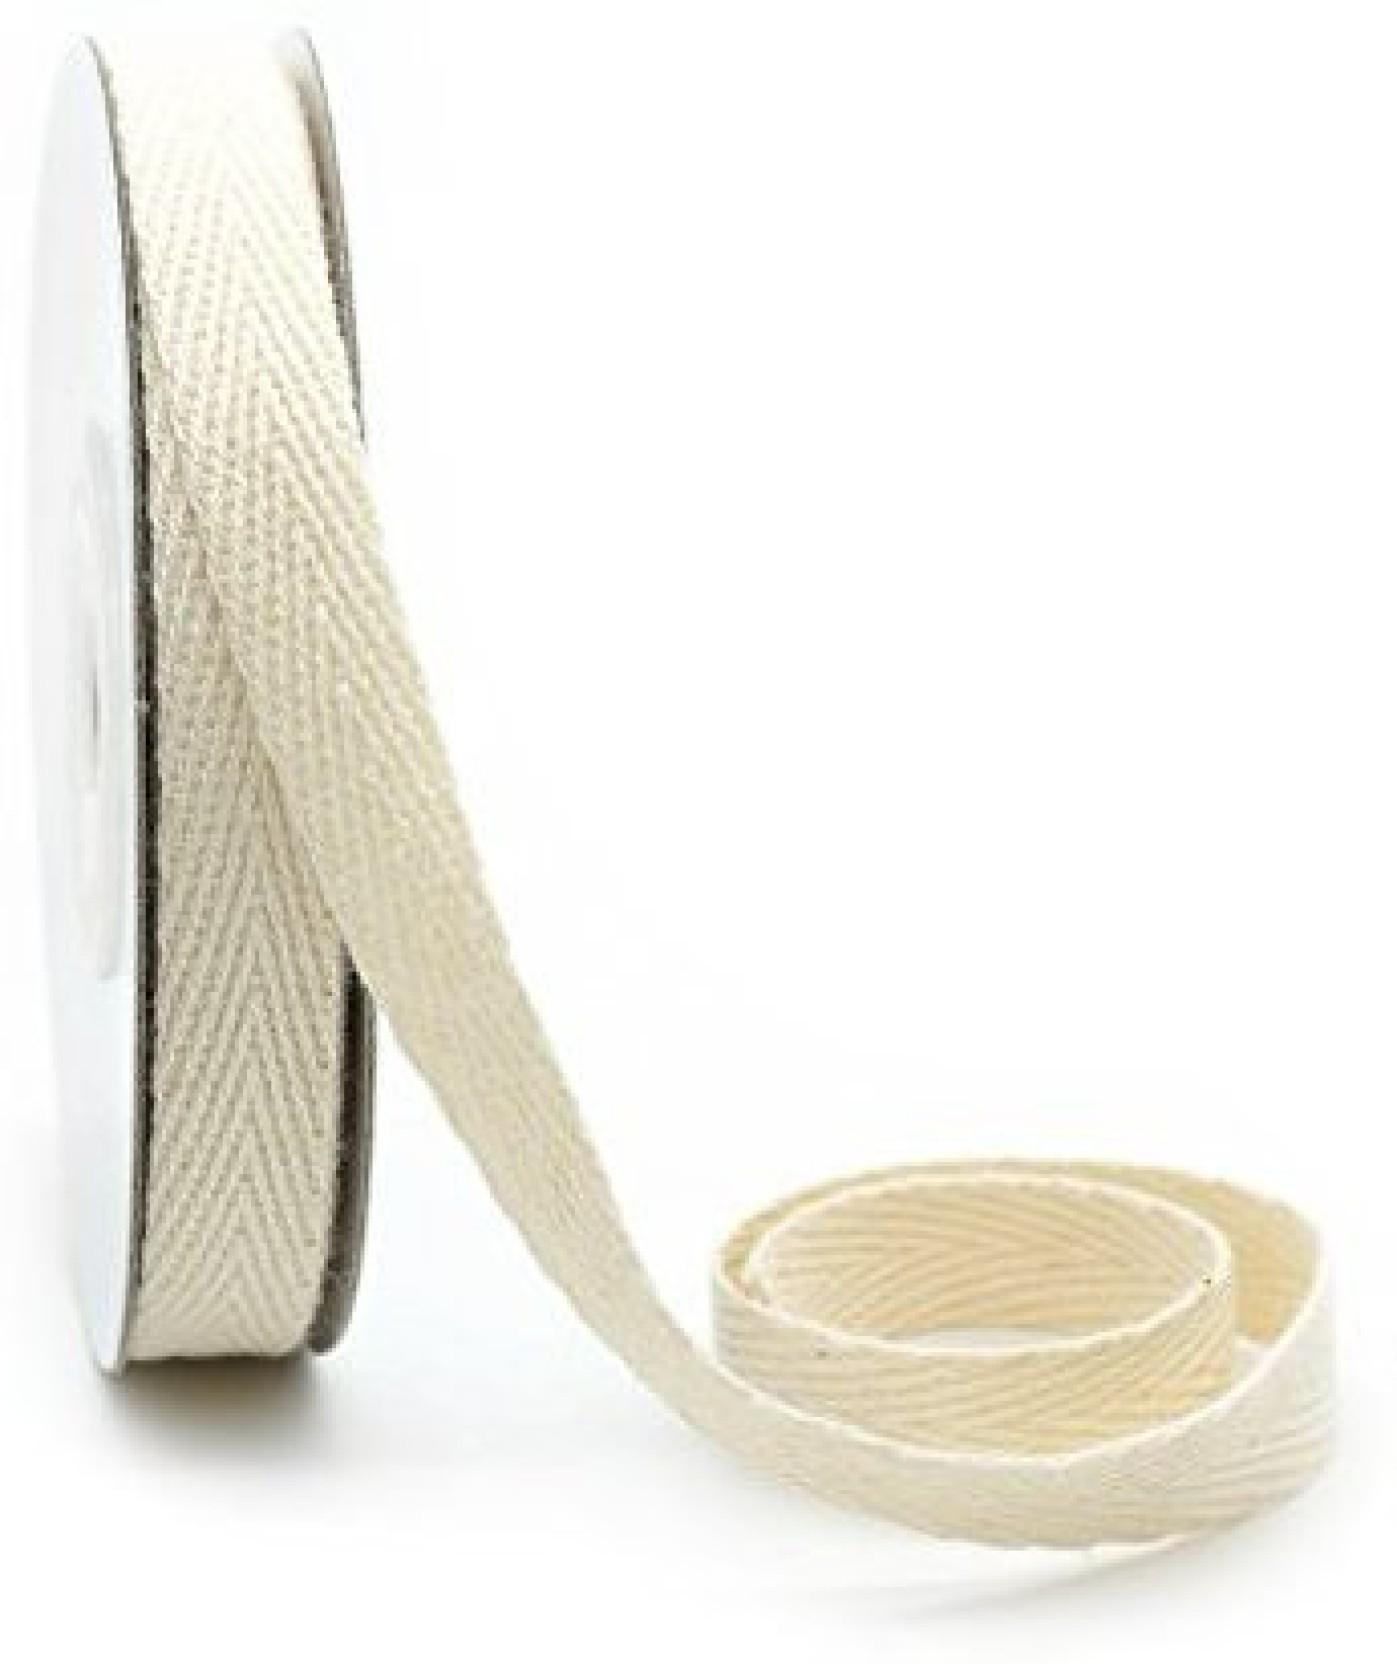 Ct Craft Llc Cotton Twill Ribbon 3/8 Inch (10Mm) X 10 Yards